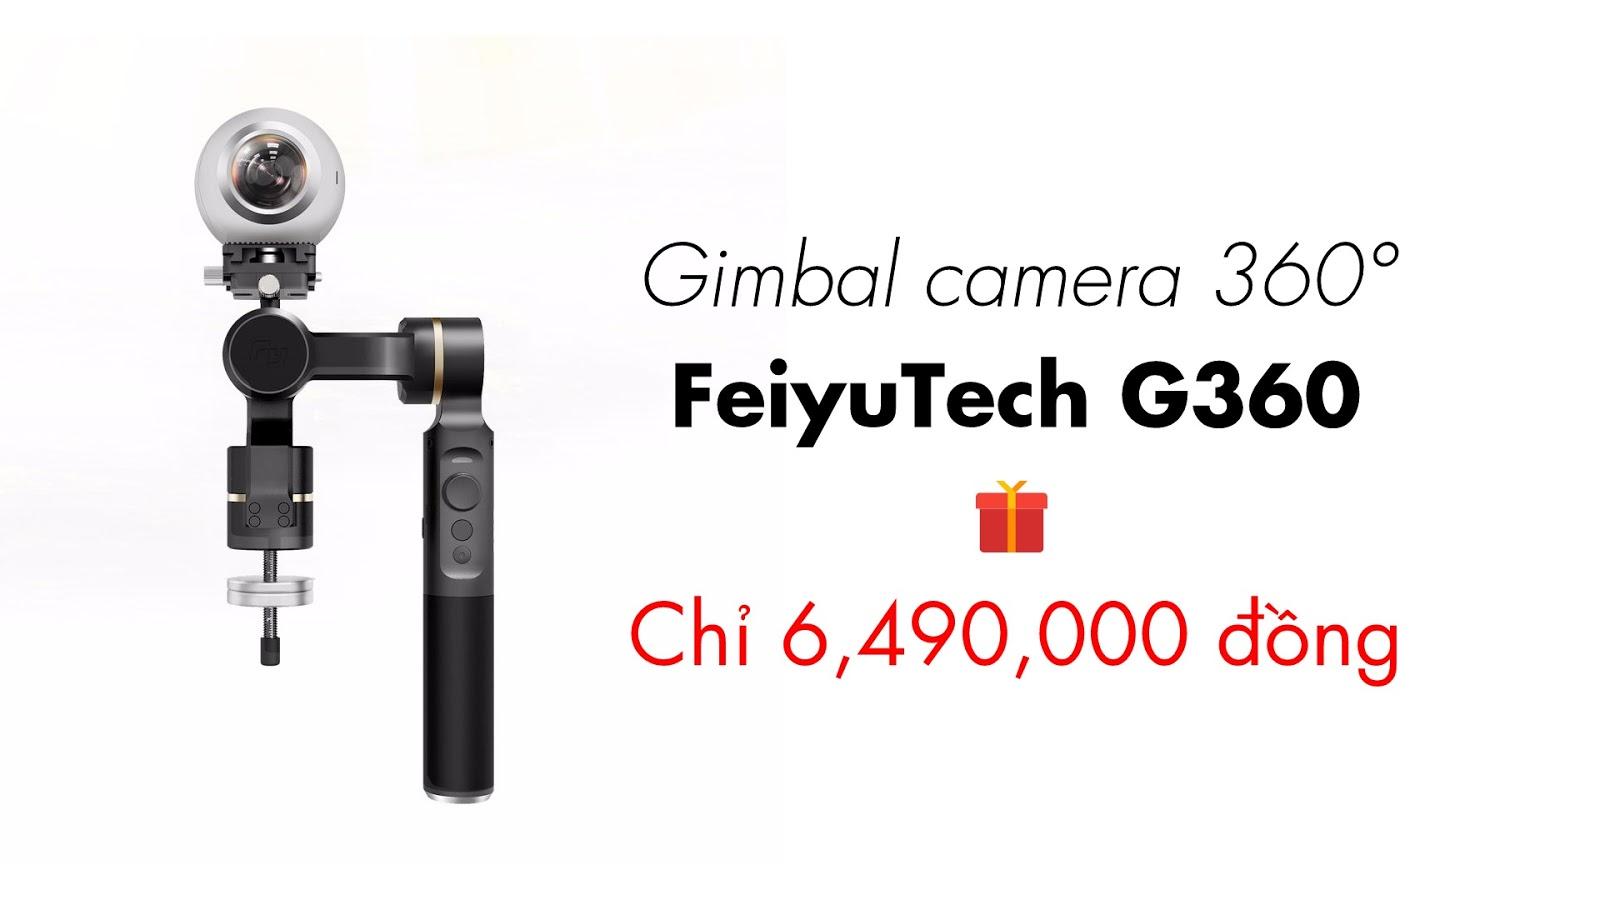 FeiyuTech G360 - gimbal chống rung camera 360 độ